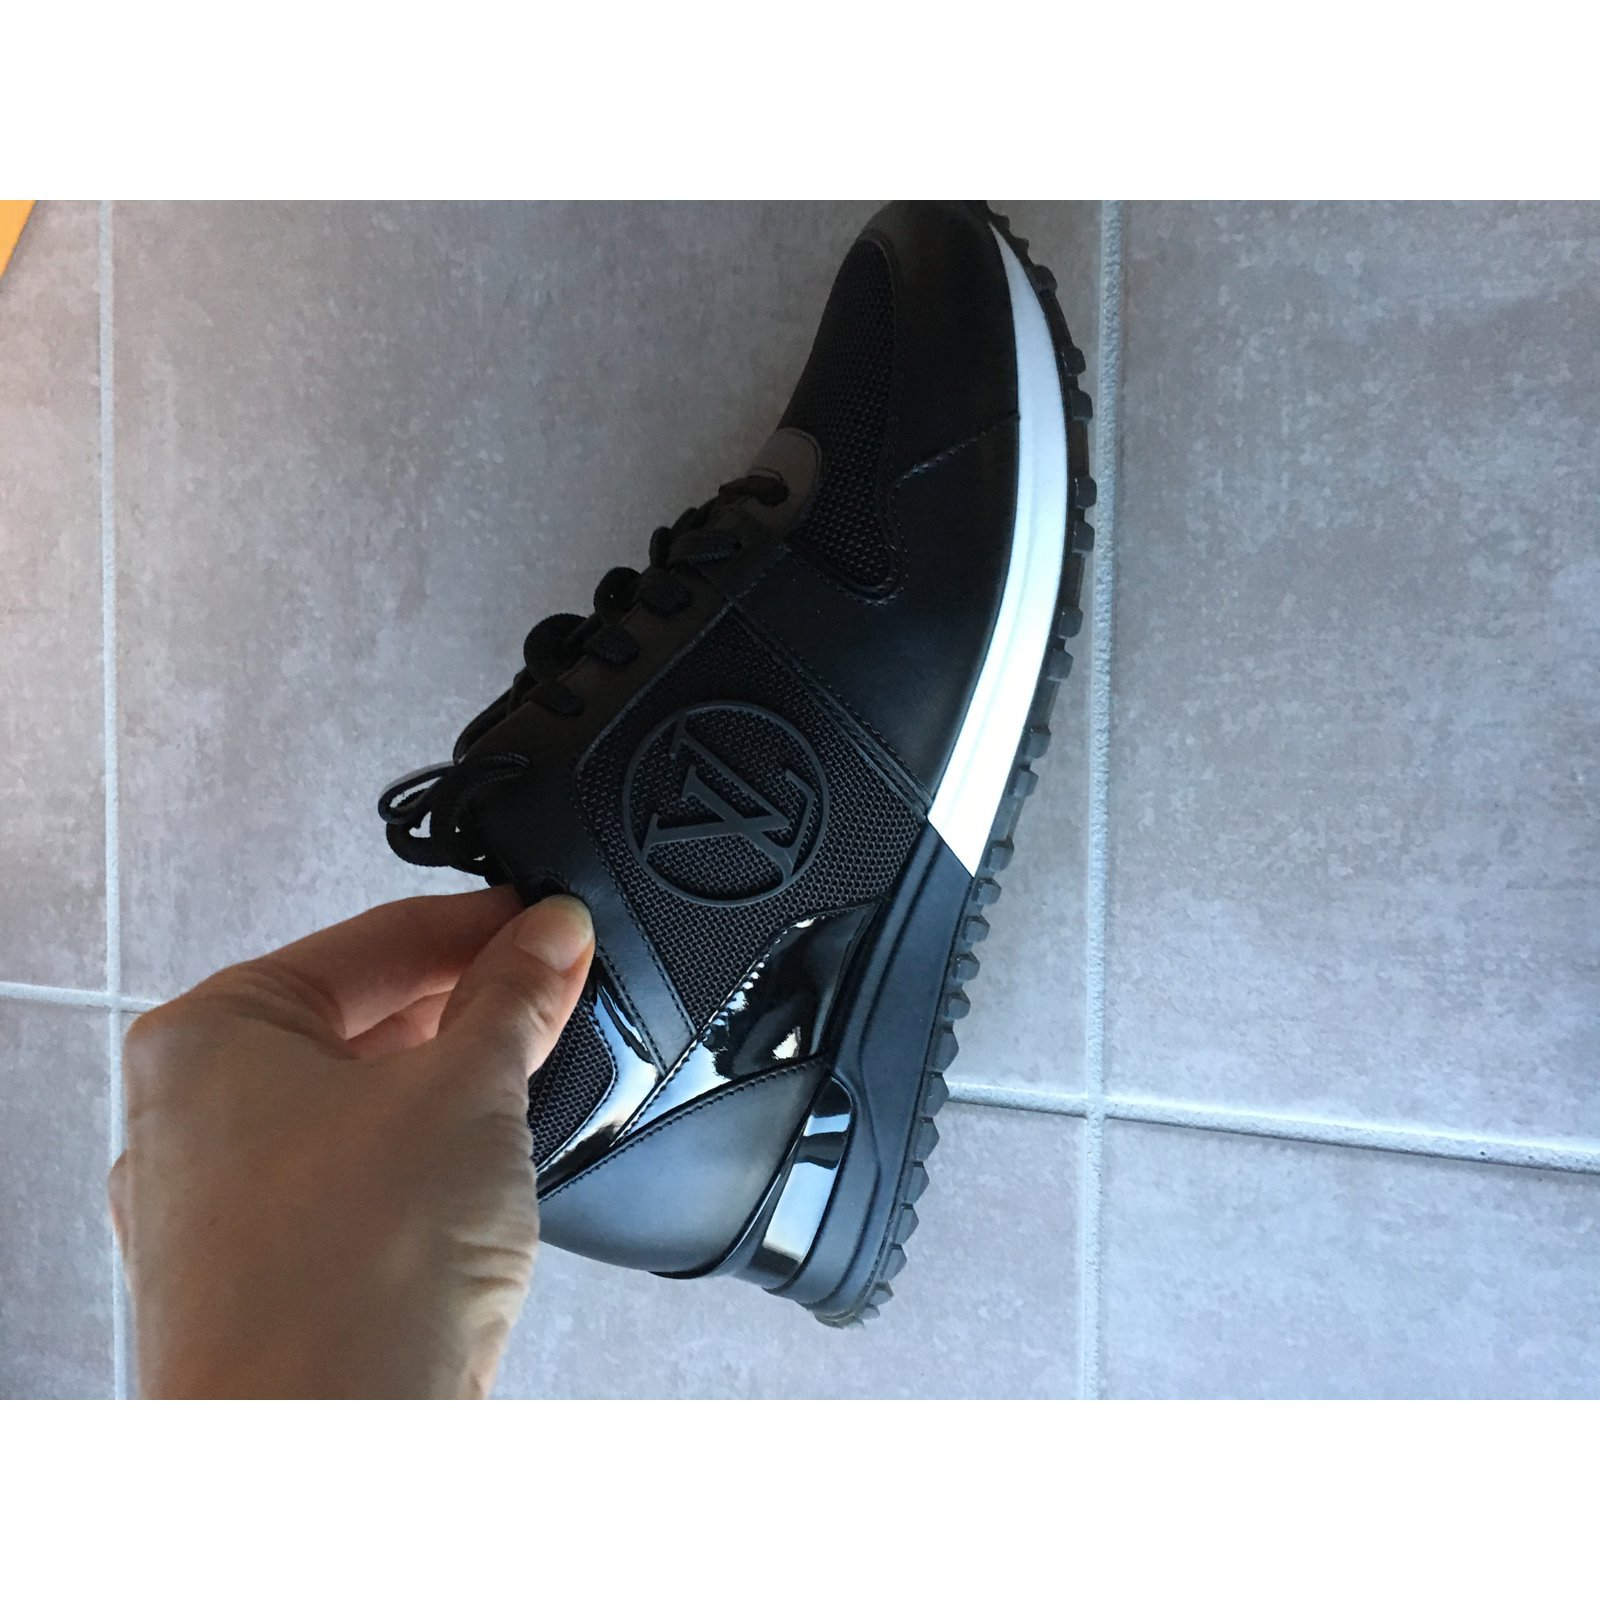 8ce7071d20a0 Sneakers louis vuitton femme noir - Labrocantederosalie.fr